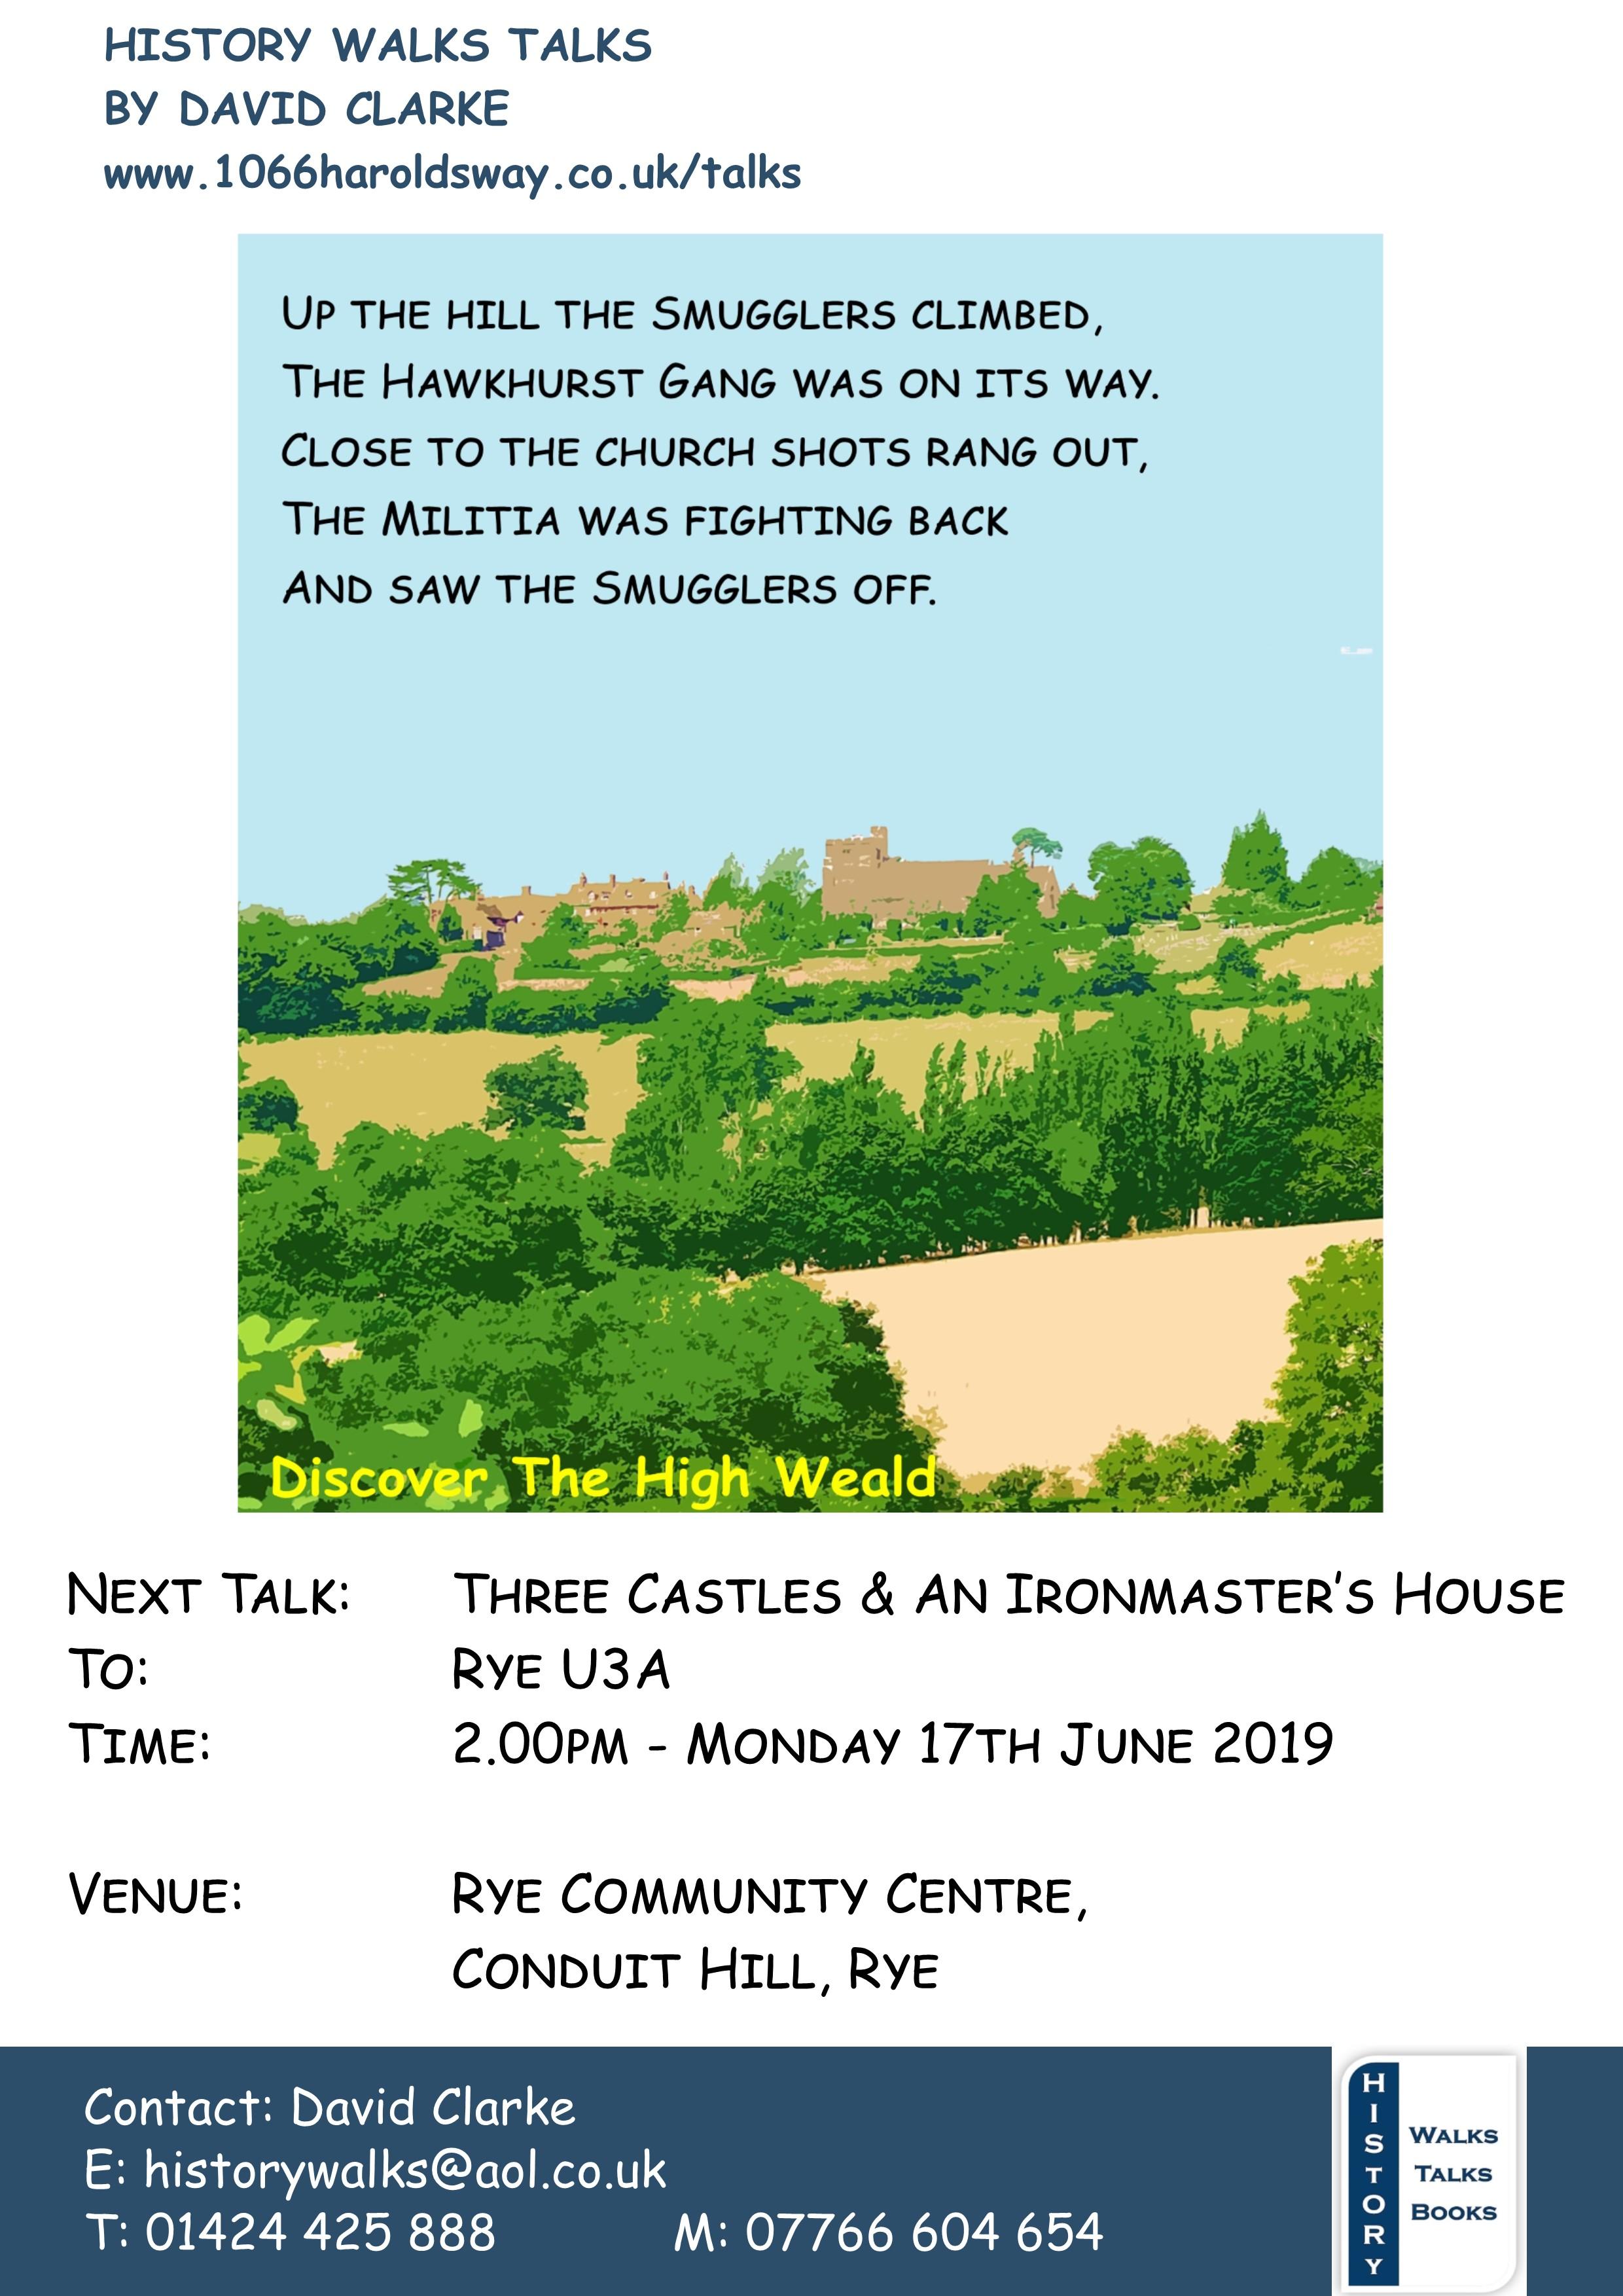 3 Castles Rye U3A